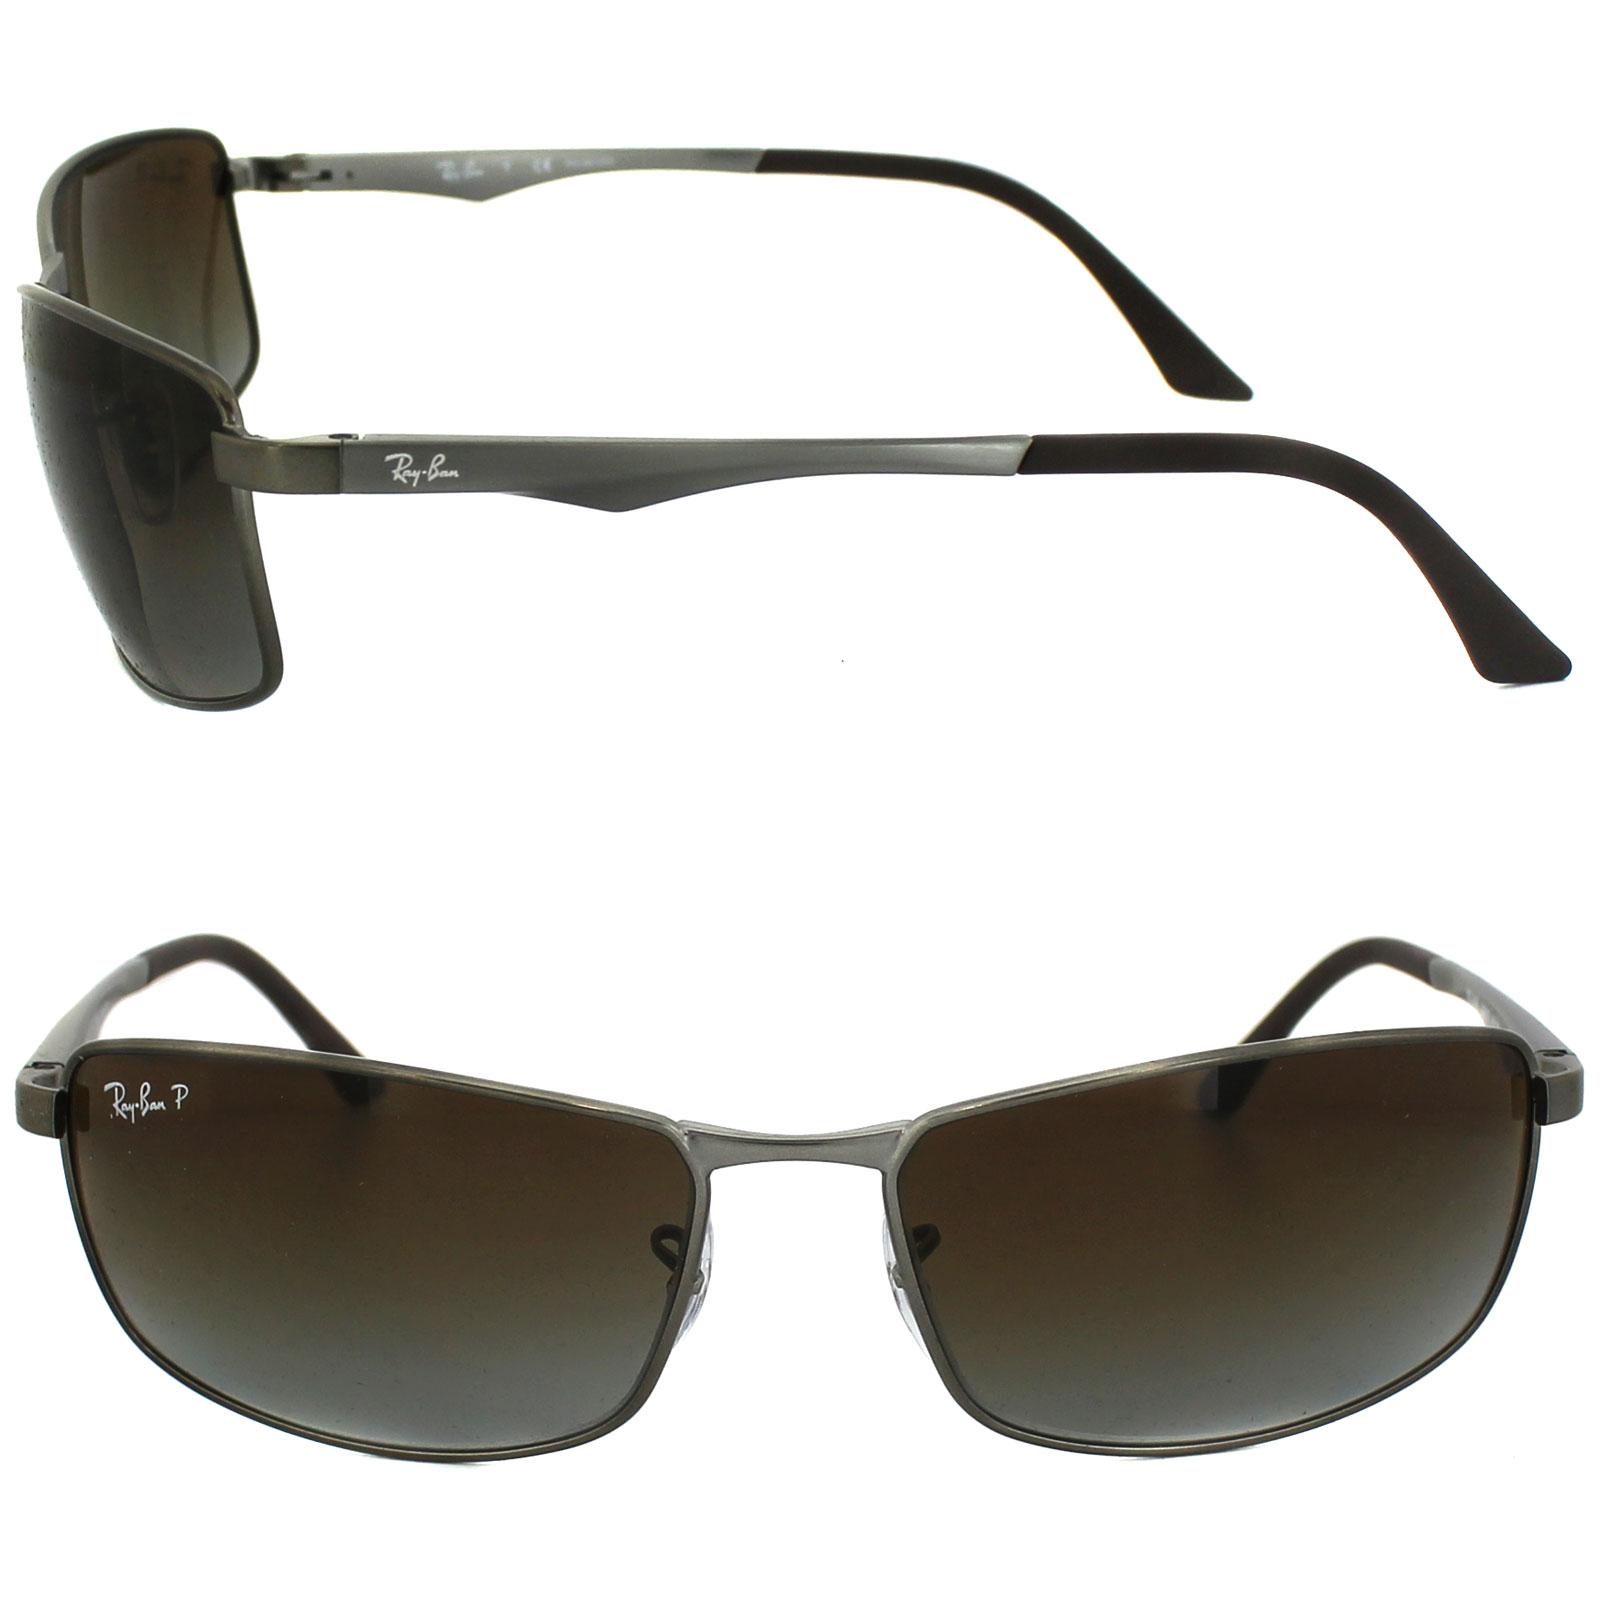 325bd21103aaca CENTINELA Polarizadas de Ray-Ban gafas de sol 3498 029 T5 Gunmetal marrón  degradado